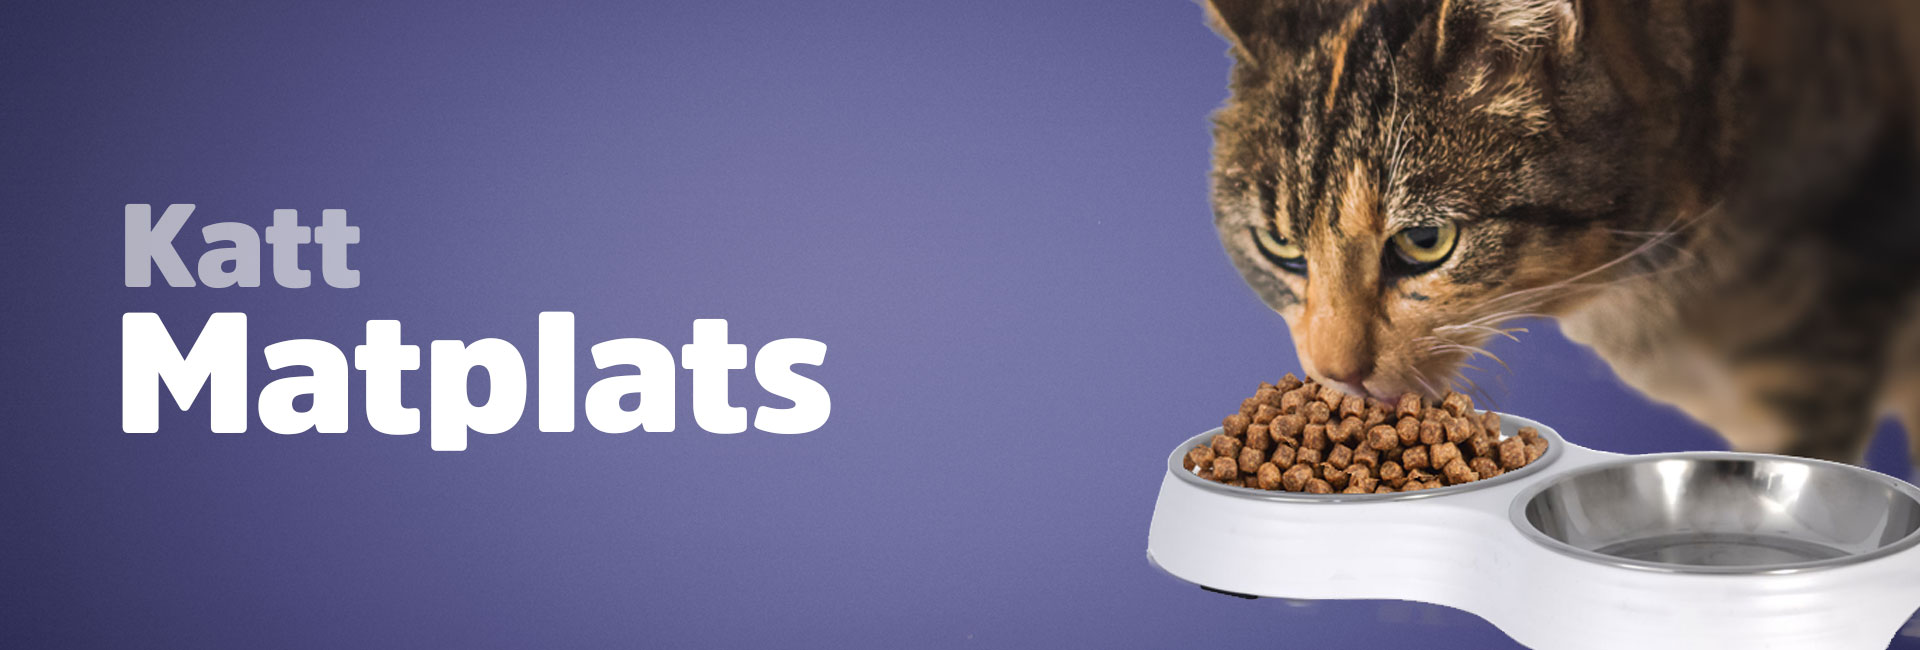 Kattskålar